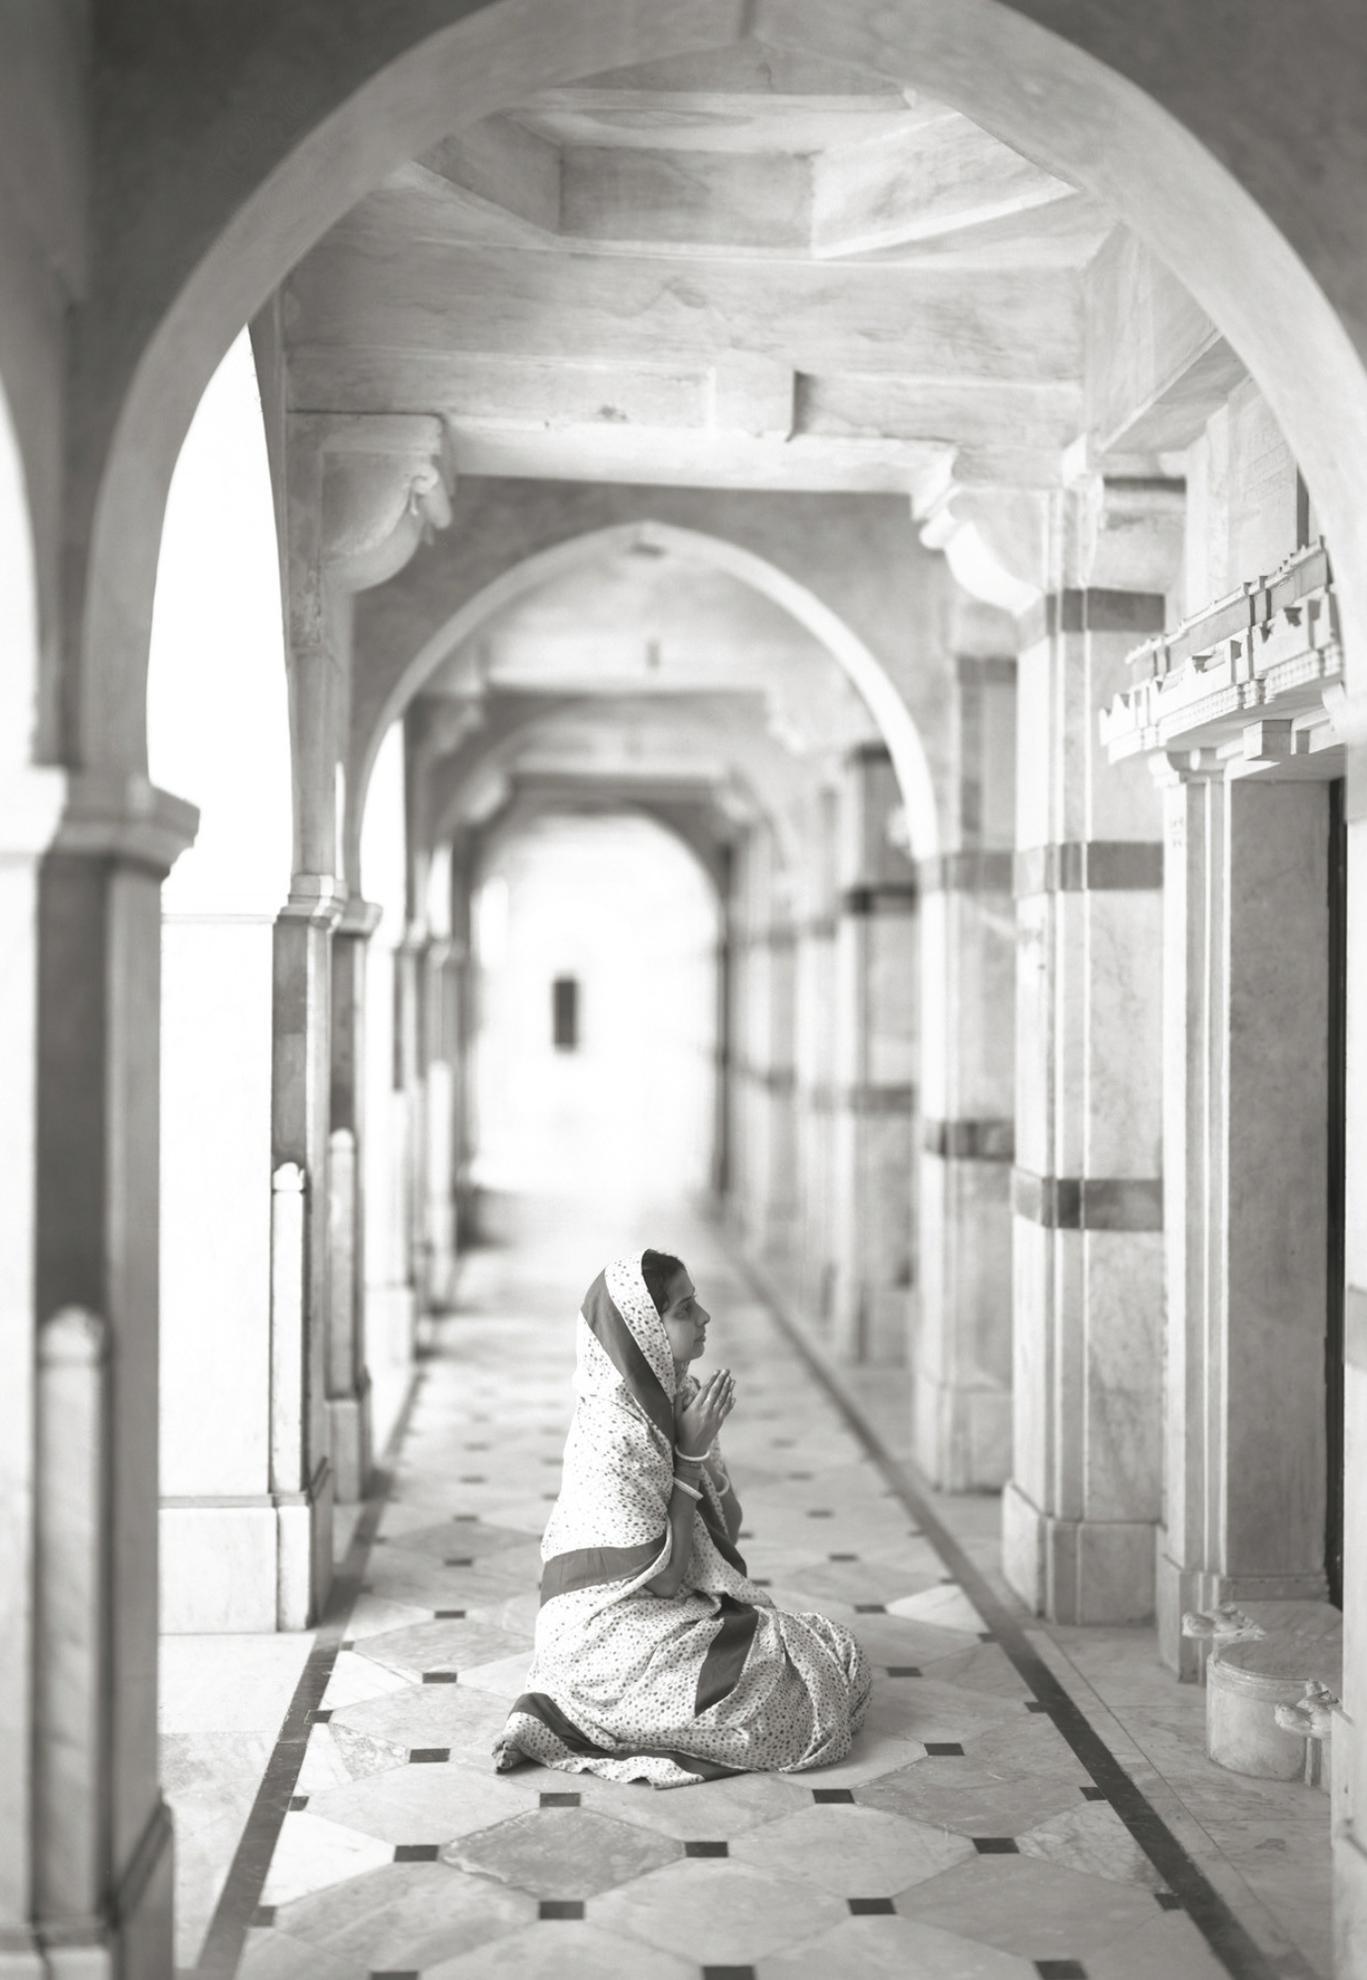 Kenro Izu-Palitana #453, Gujarat, India-2010